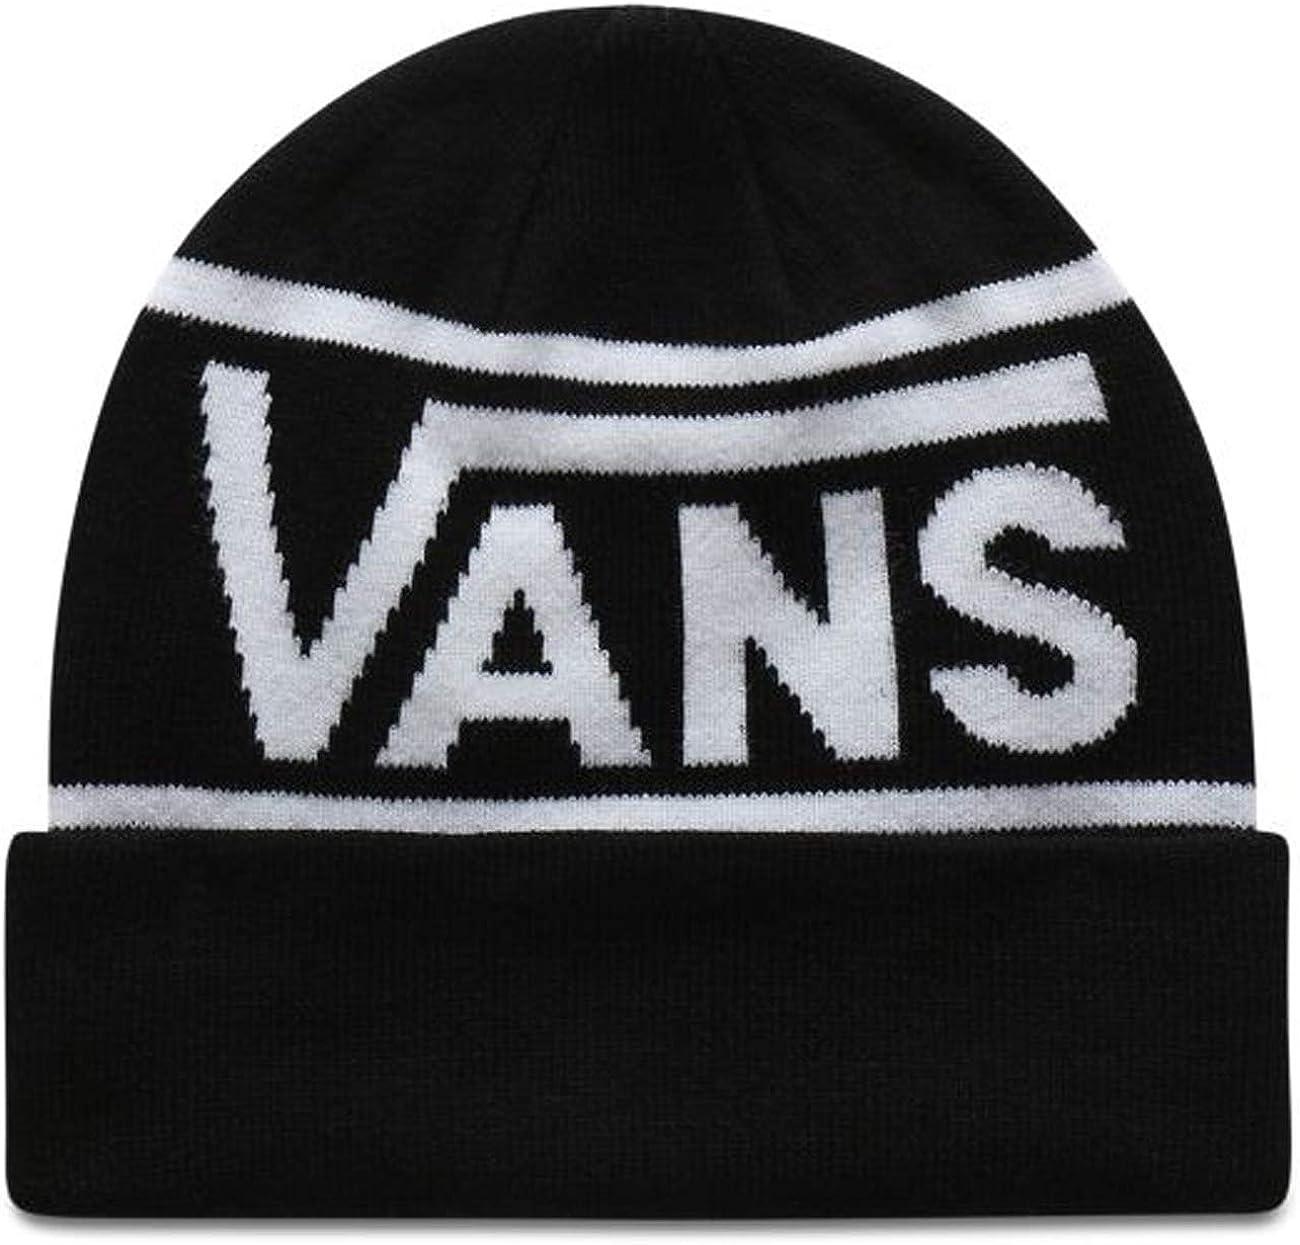 Vans Gorro (Beanie) Drop V Stripe Cuff Negro OSFA (Talla única ...